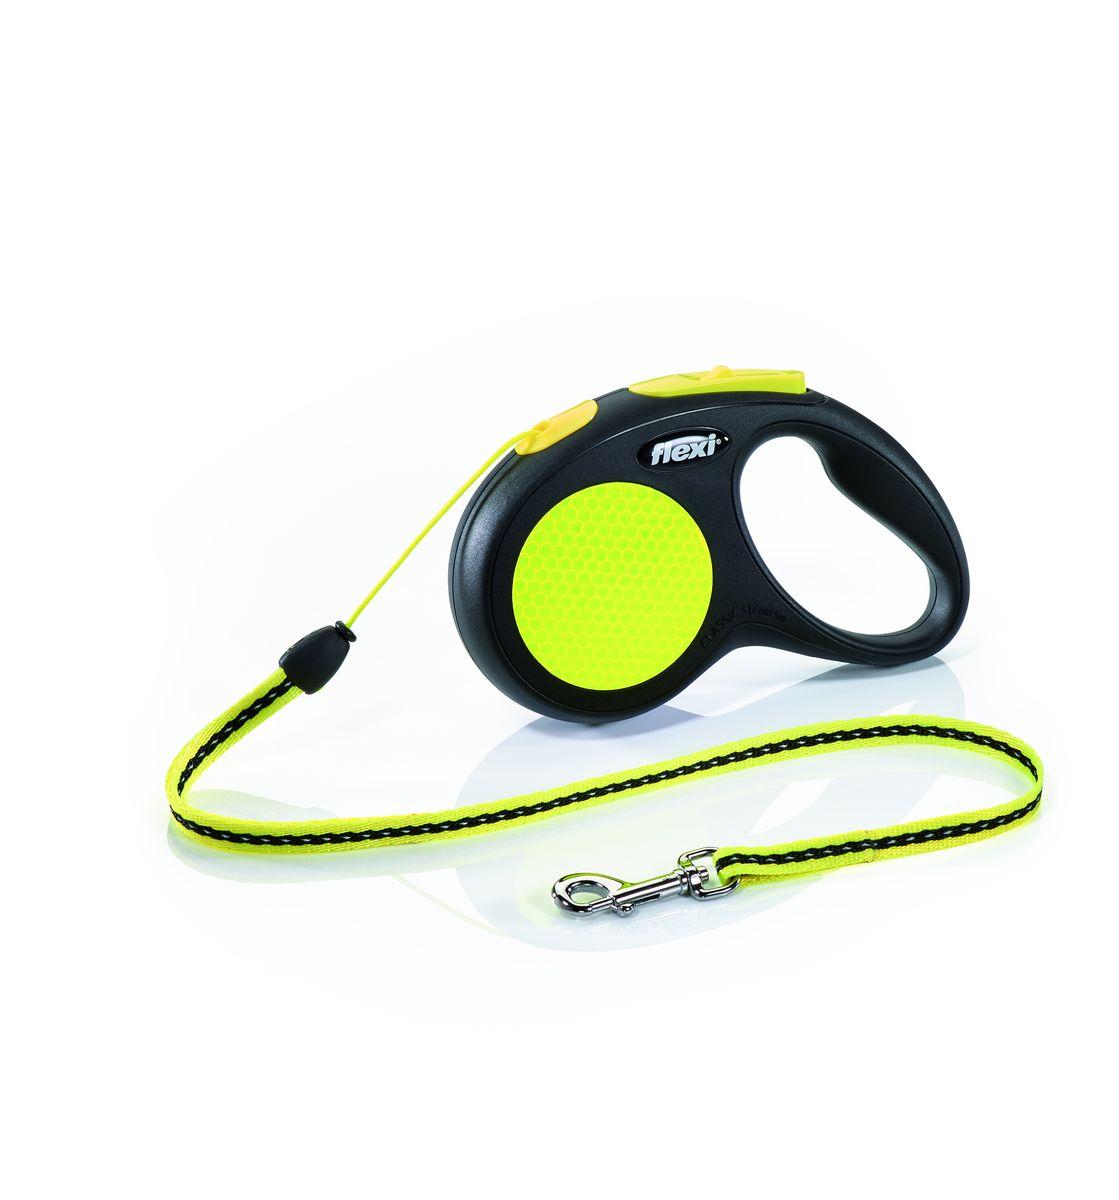 "Поводок-рулетка Flexi ""Neon New Classic S"", трос, для собак весом до 12 кг, 5 м"